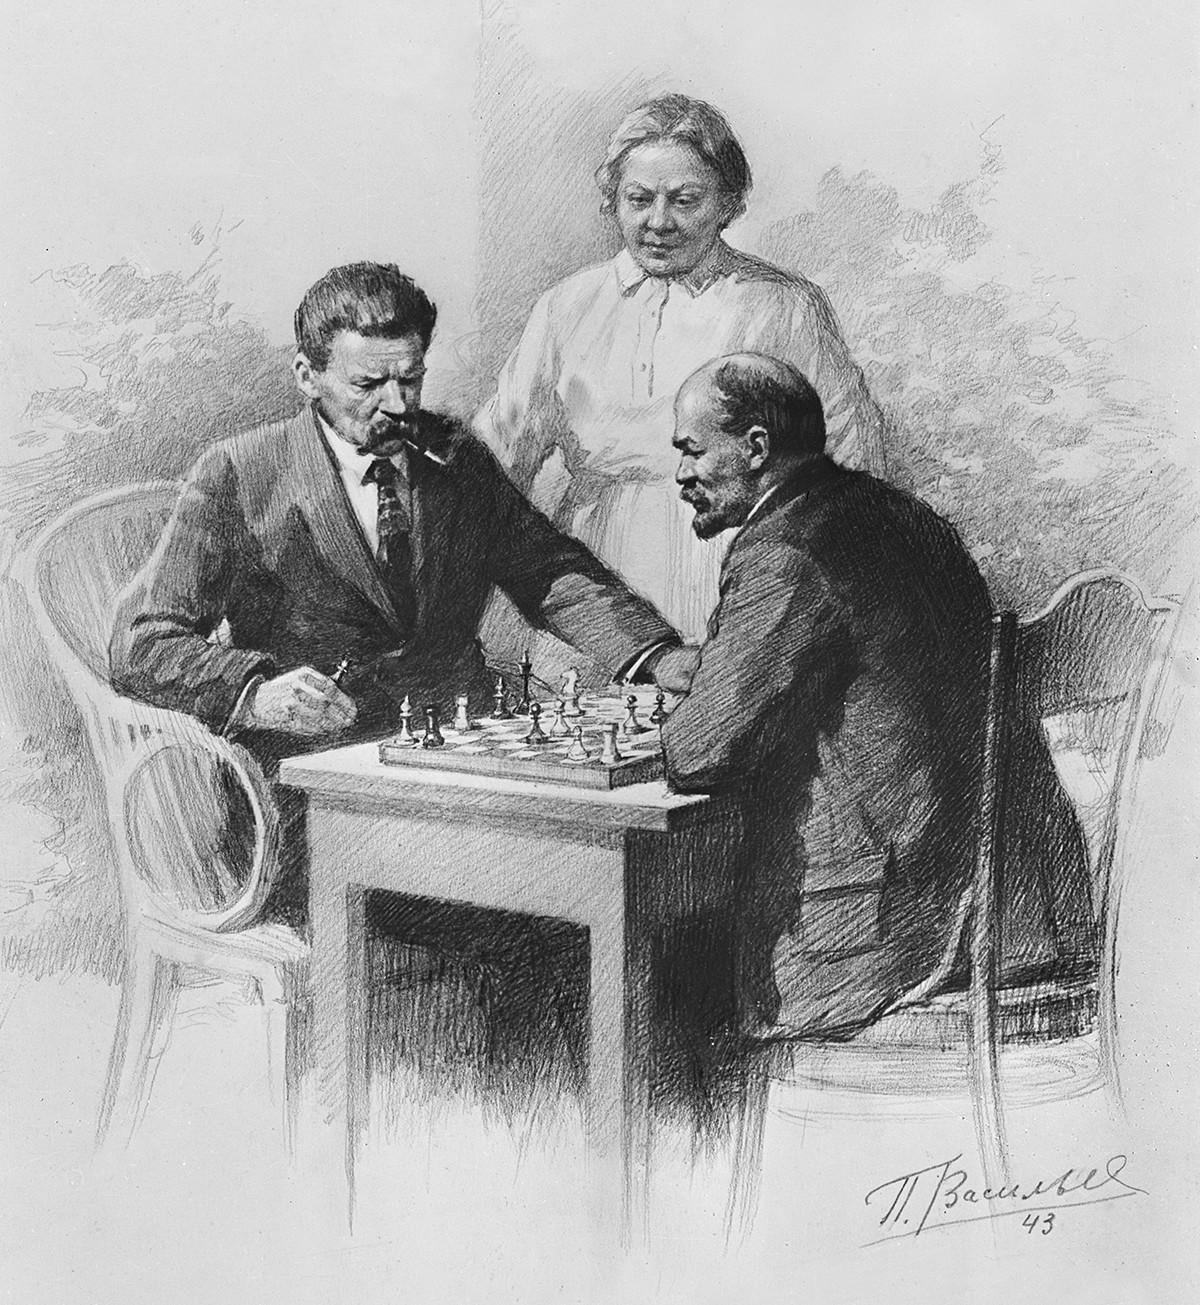 Dibujo 'Vladímir Lenin, Maxim Gorki y Nadezhda Krúpskaia' de Piotr Vasílyev.